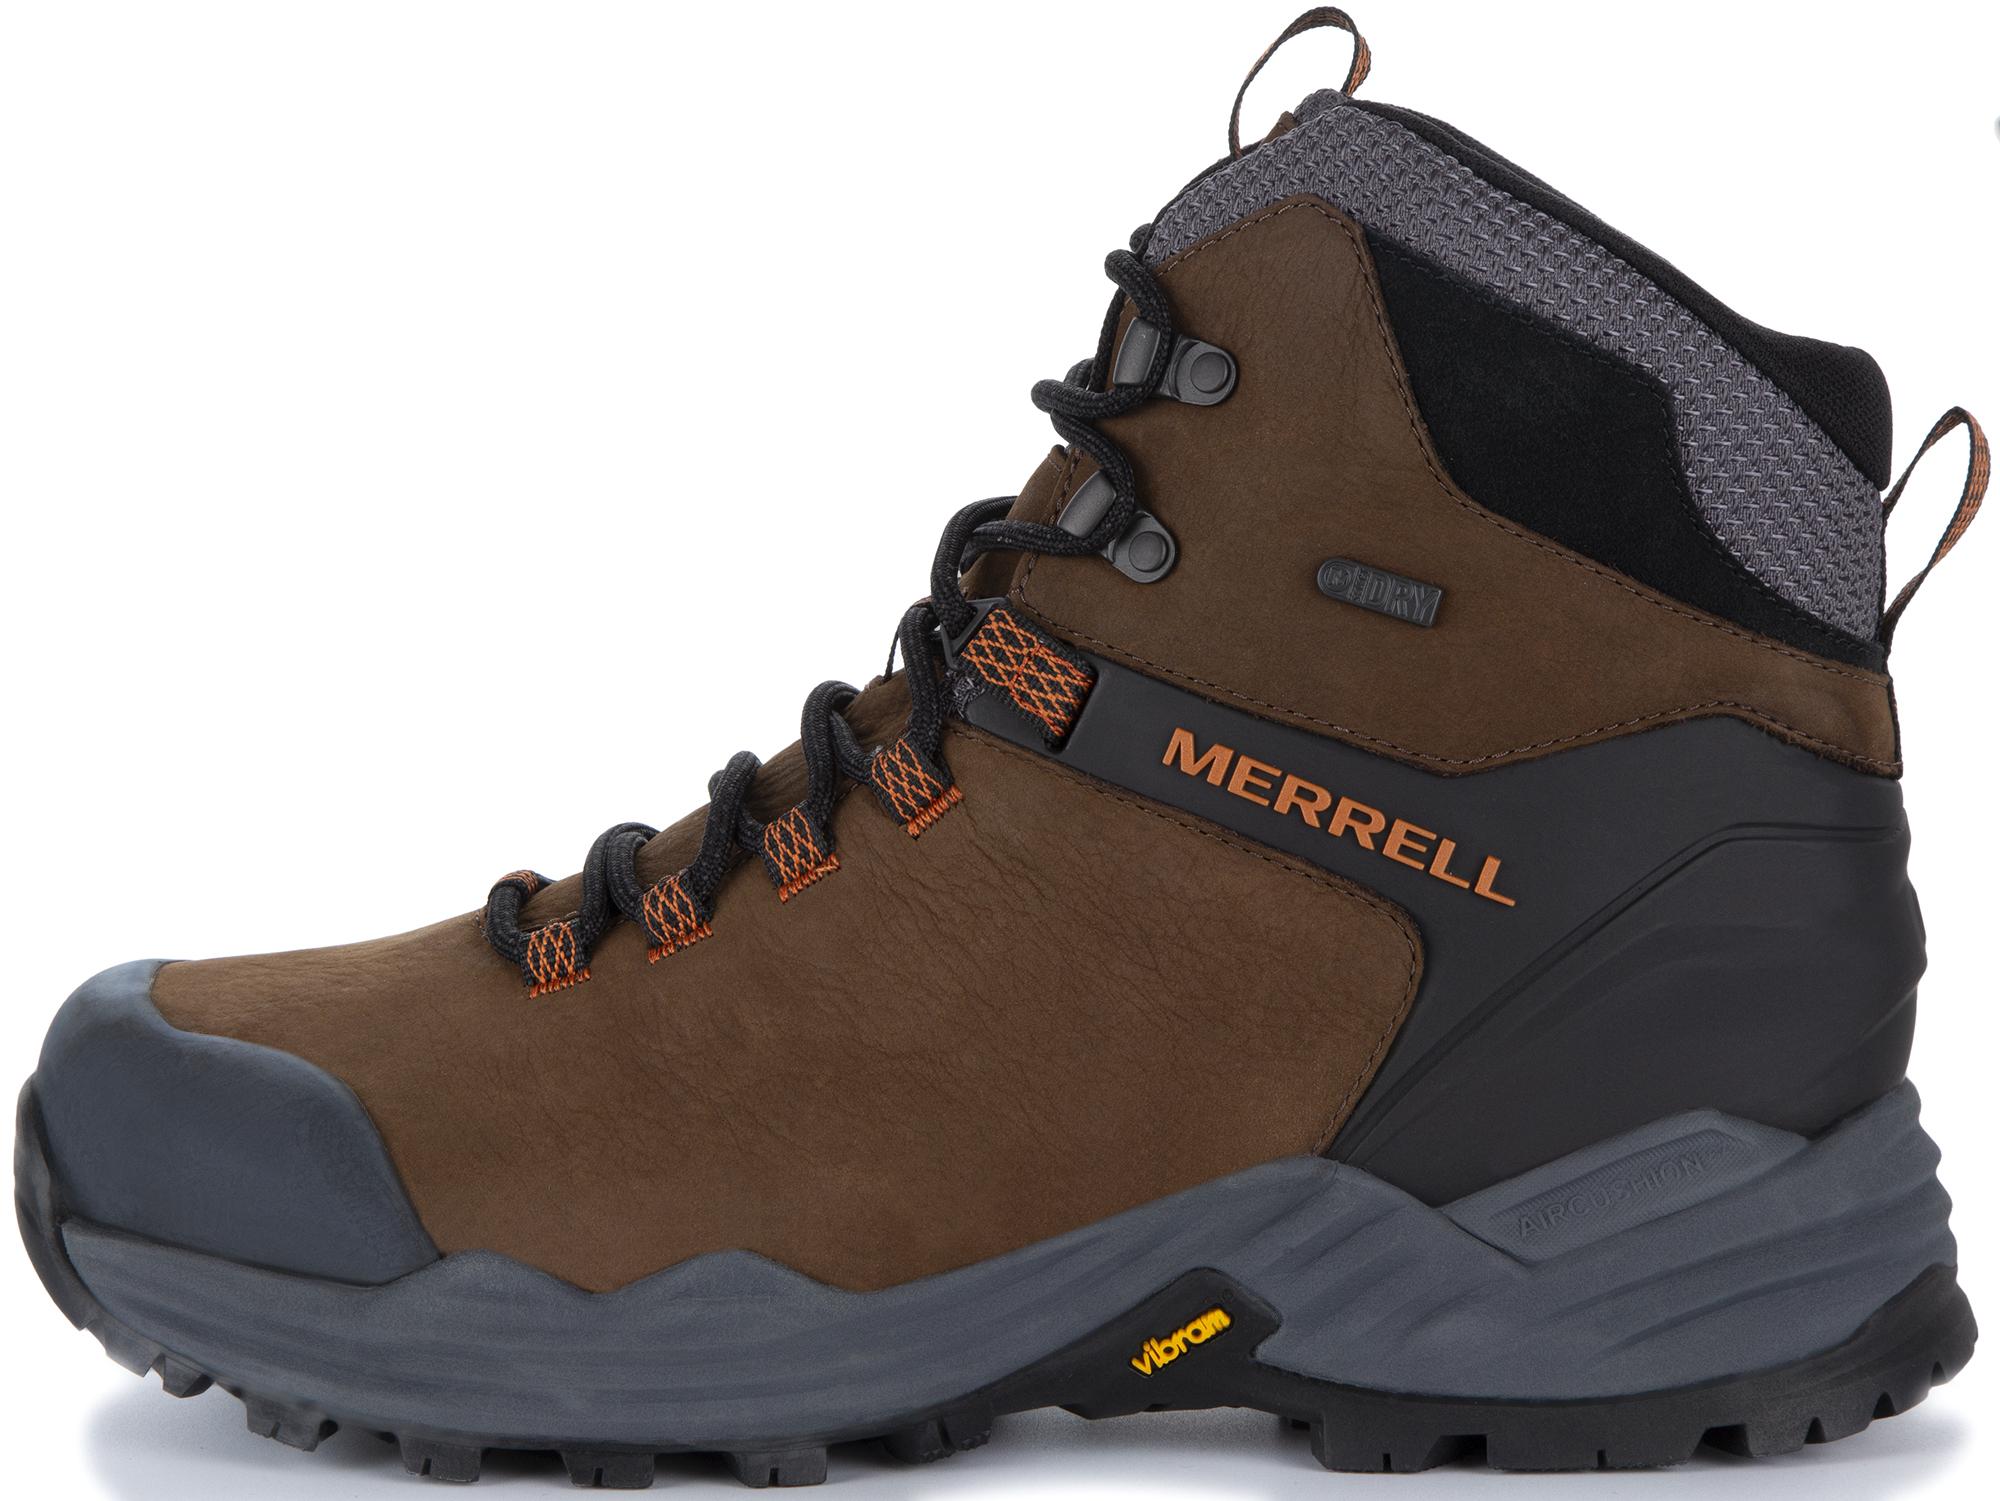 цена Merrell Ботинки мужские Merrell Phaserbound 2, размер 42 онлайн в 2017 году